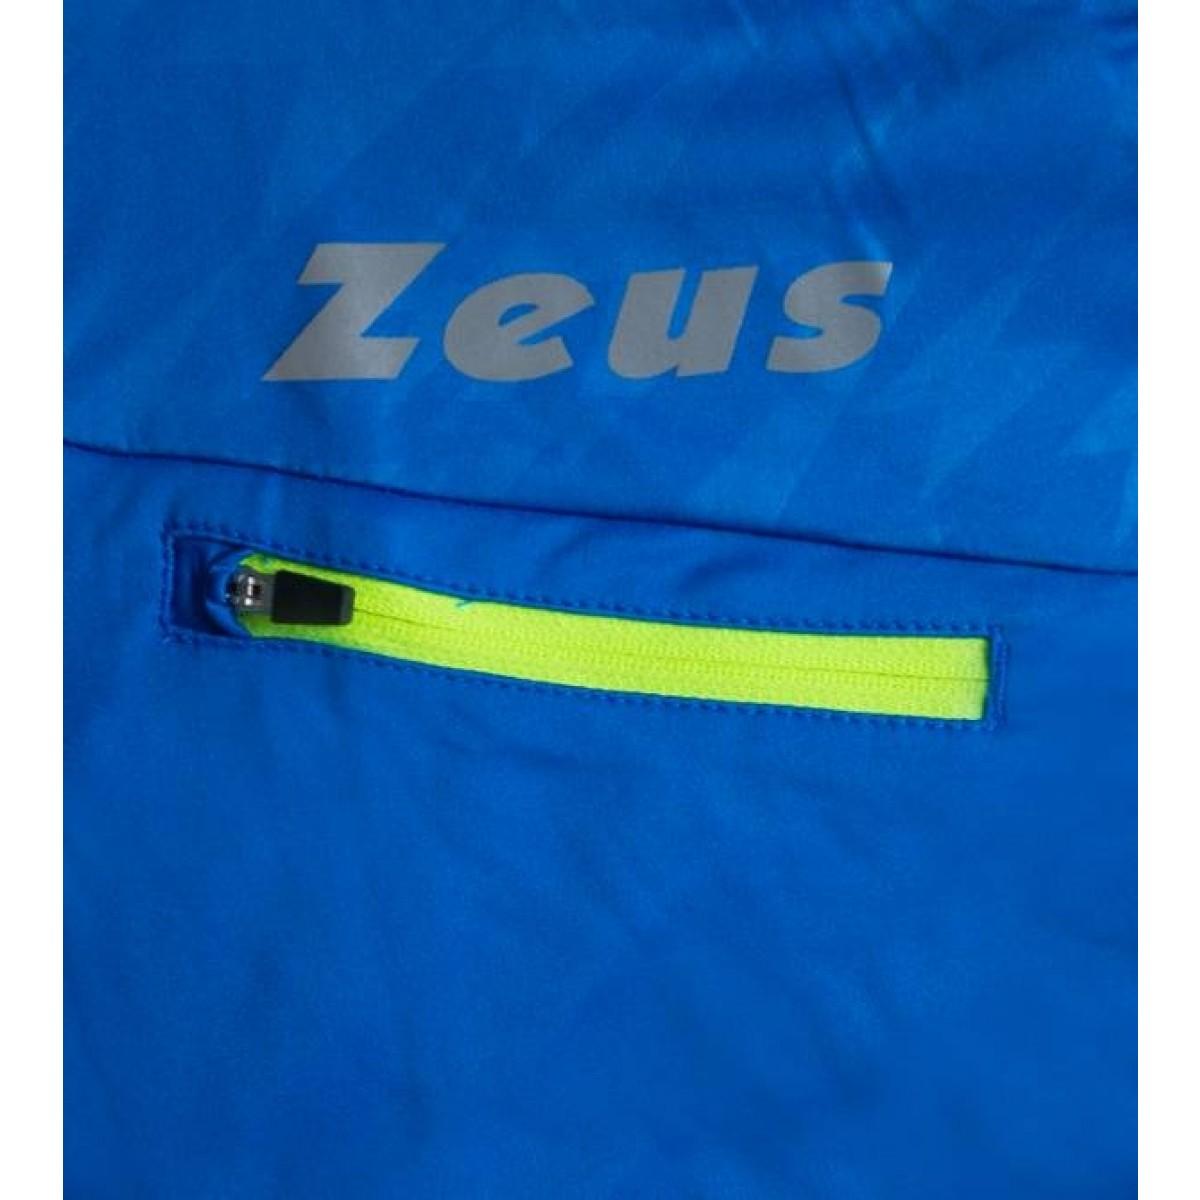 Zeus Atlante loebejakke blaa neon gul hvid